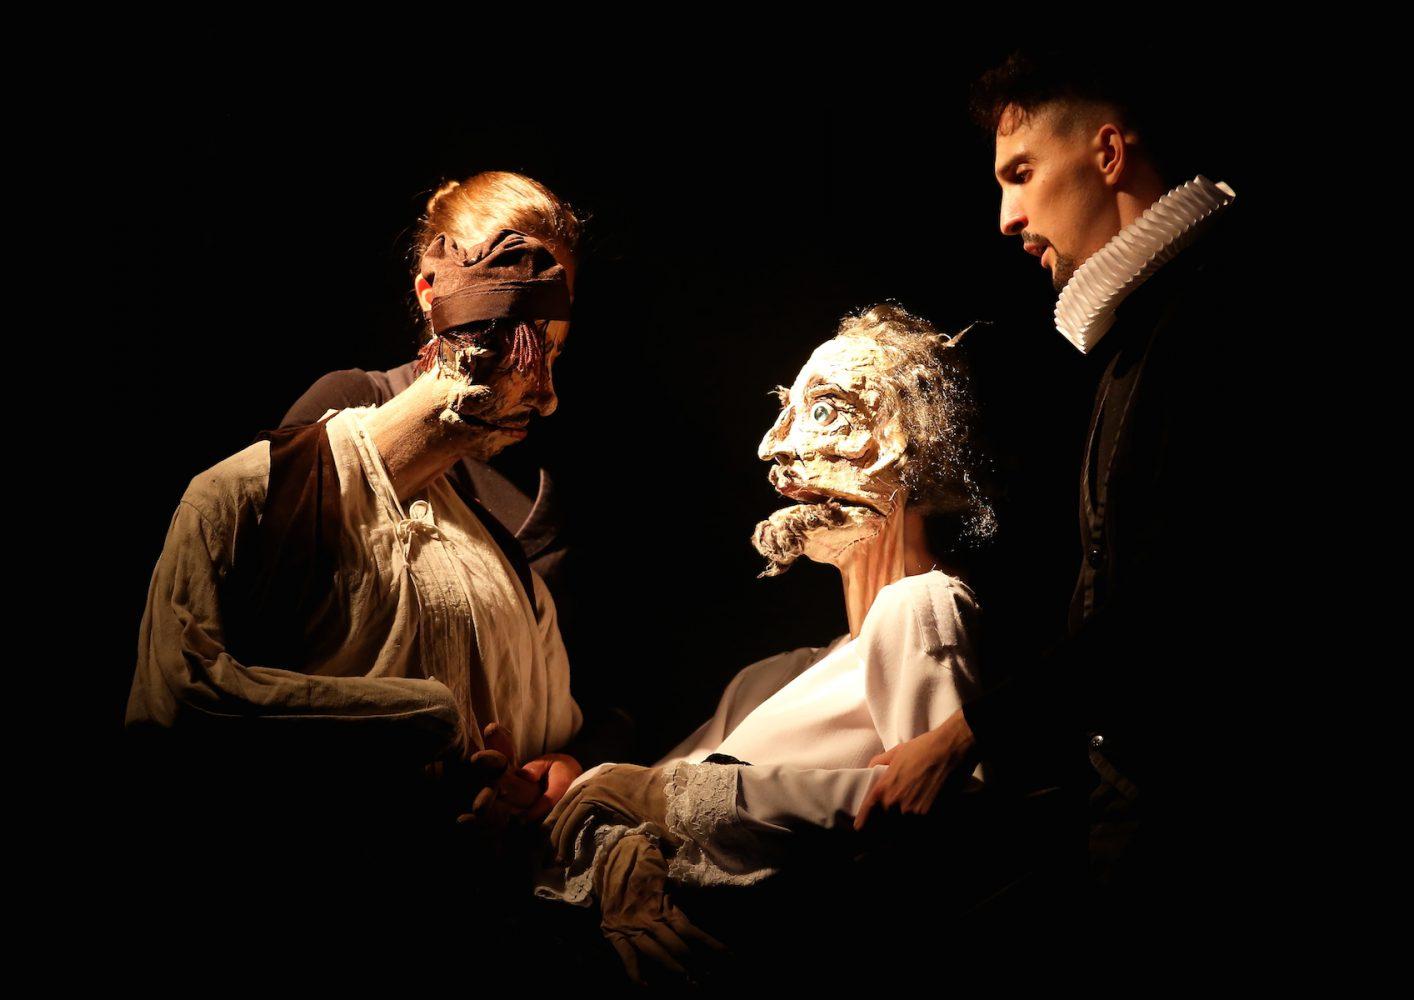 cervantes: don quijote schuberttheater 2013 habjan, linshalm